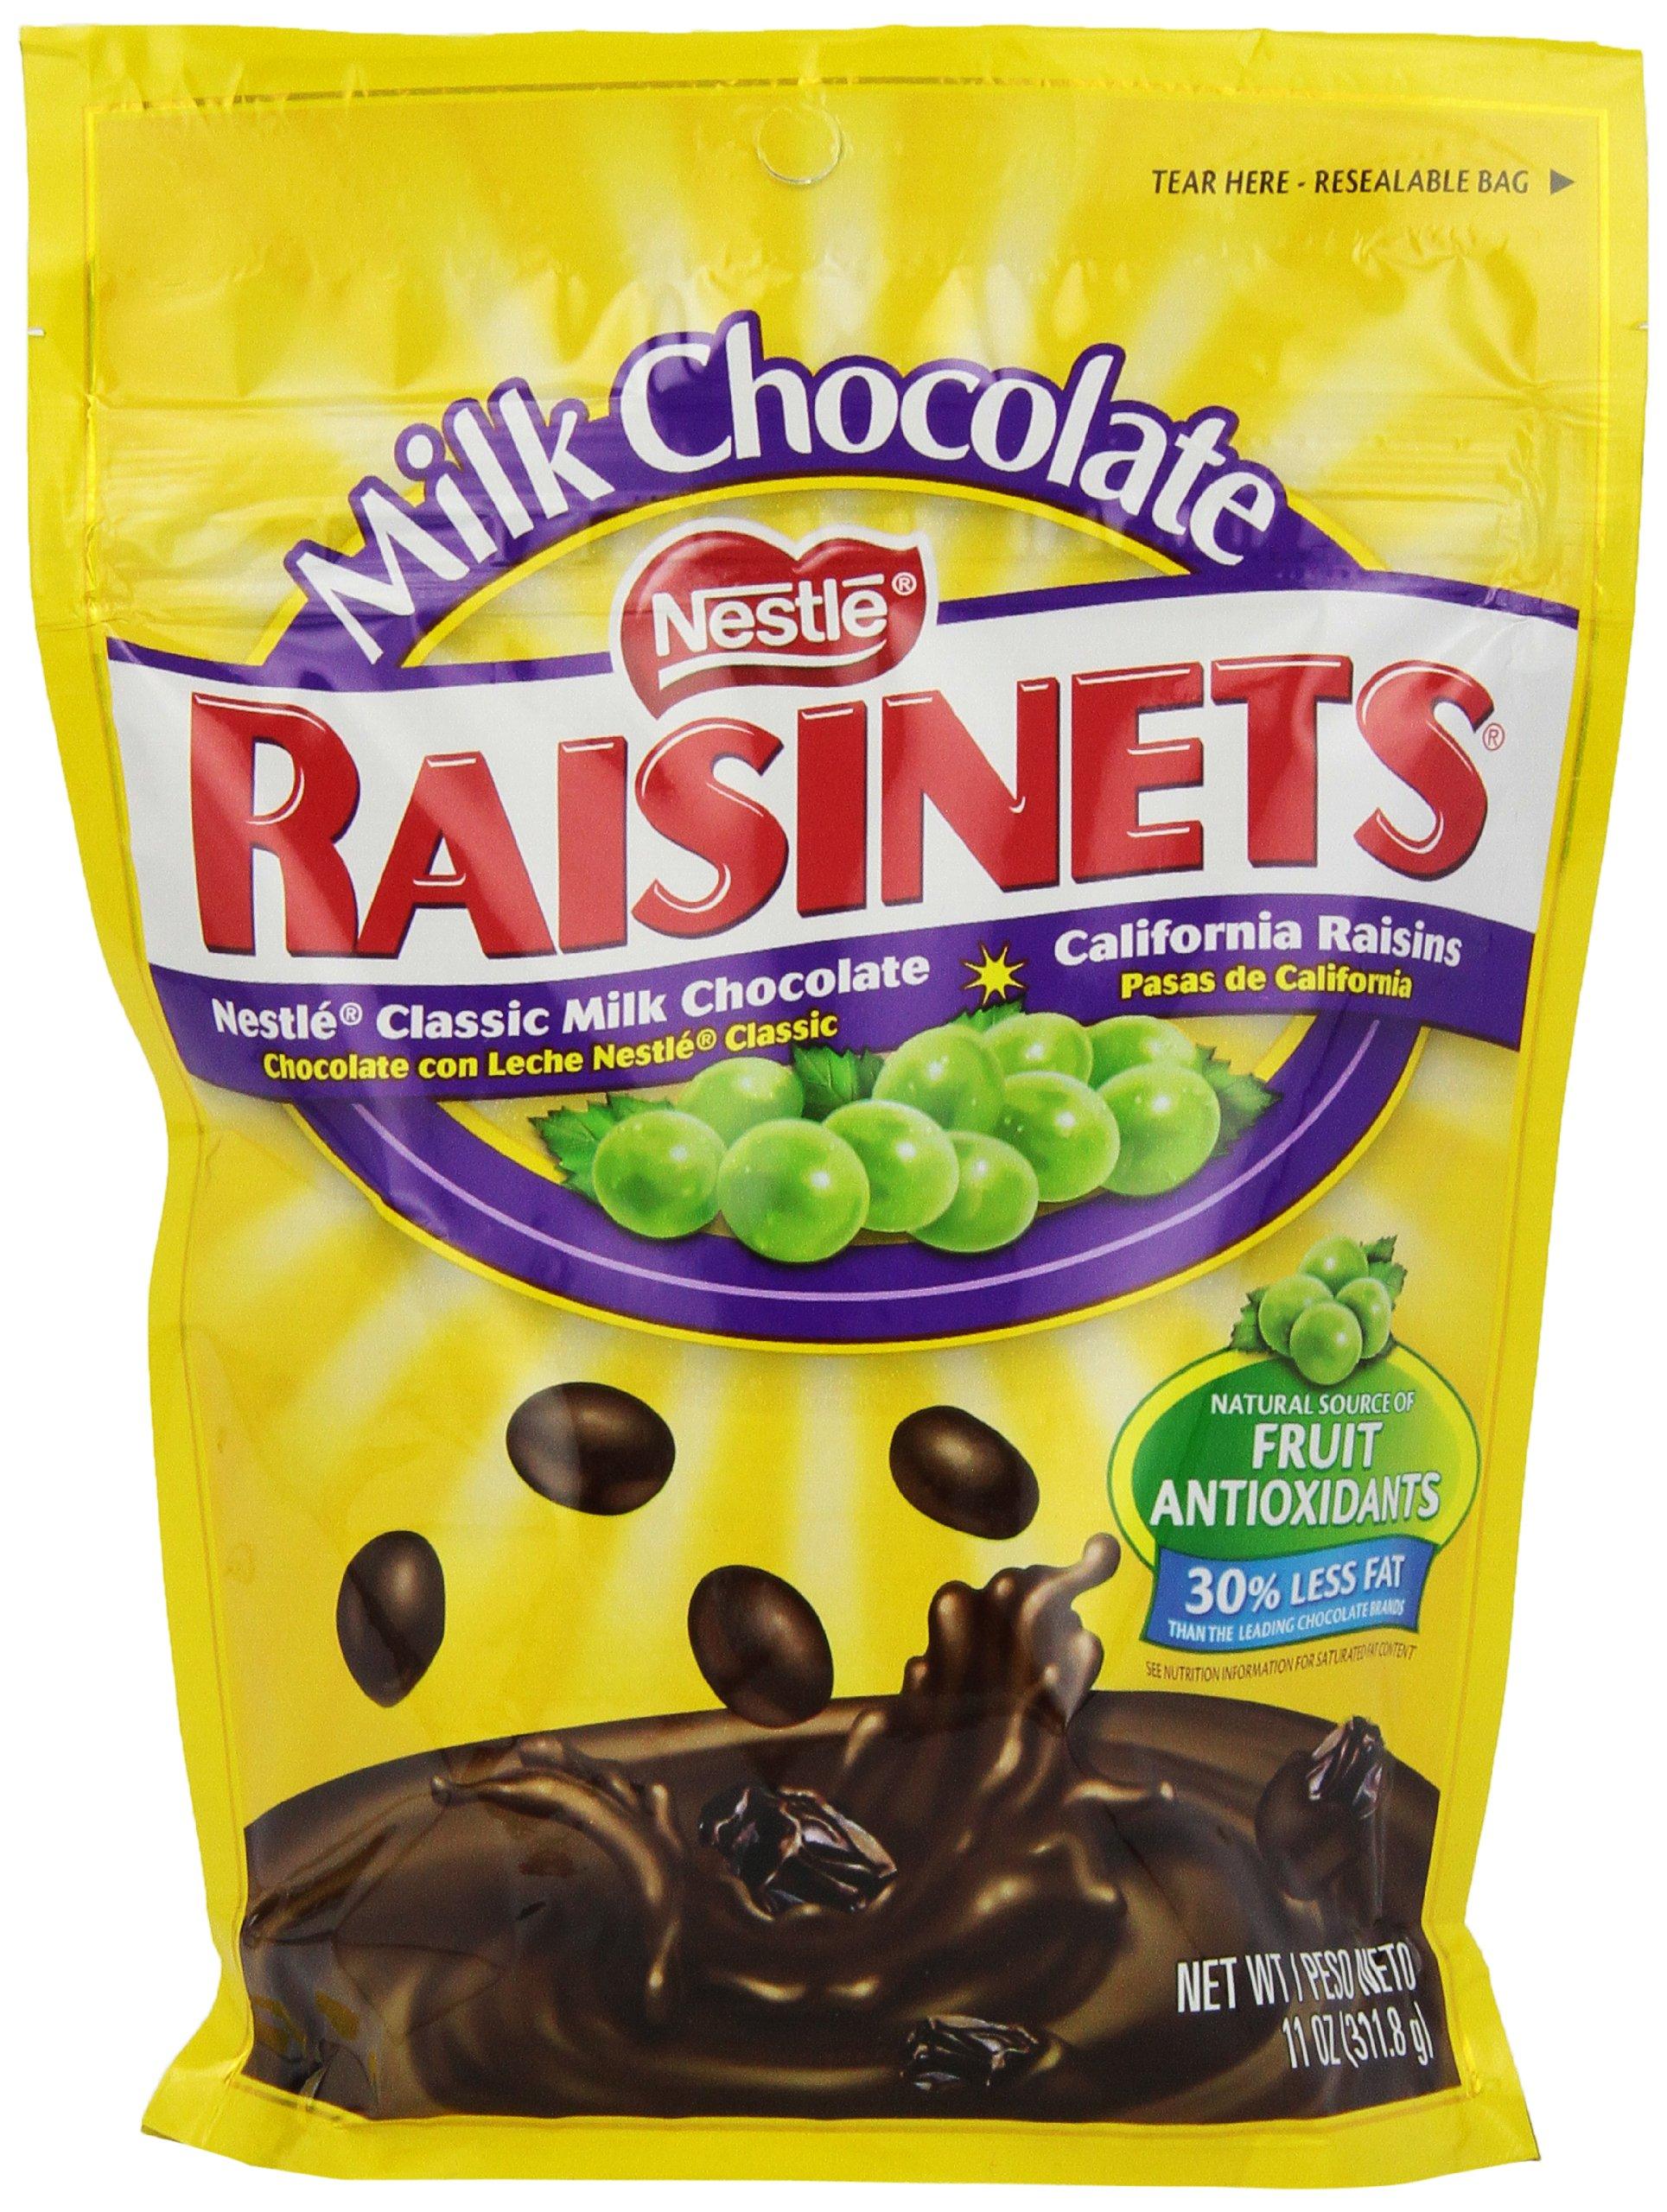 Nestle, Raisinets, Milk Chocolate Covered Raisins, 11oz Bag (Pack of 6)